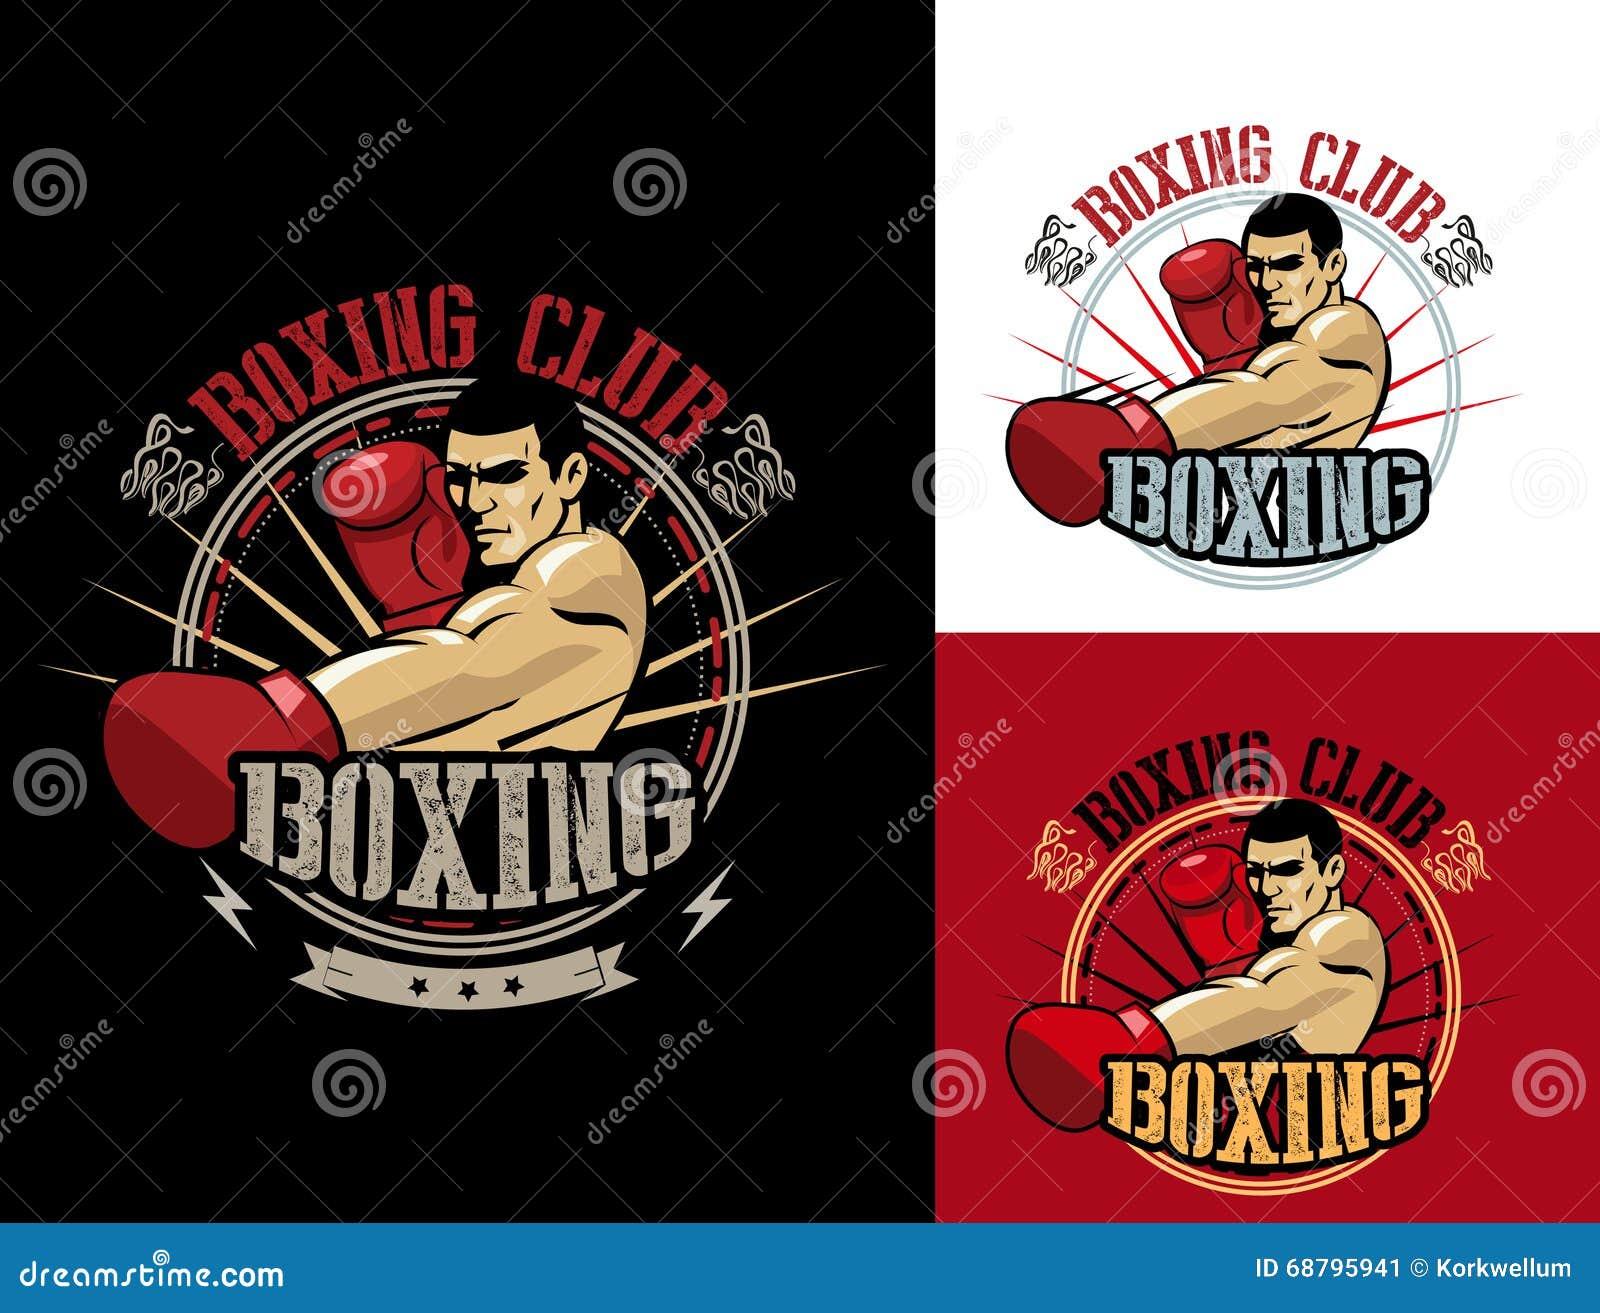 Everlast boxing  Wikipedia